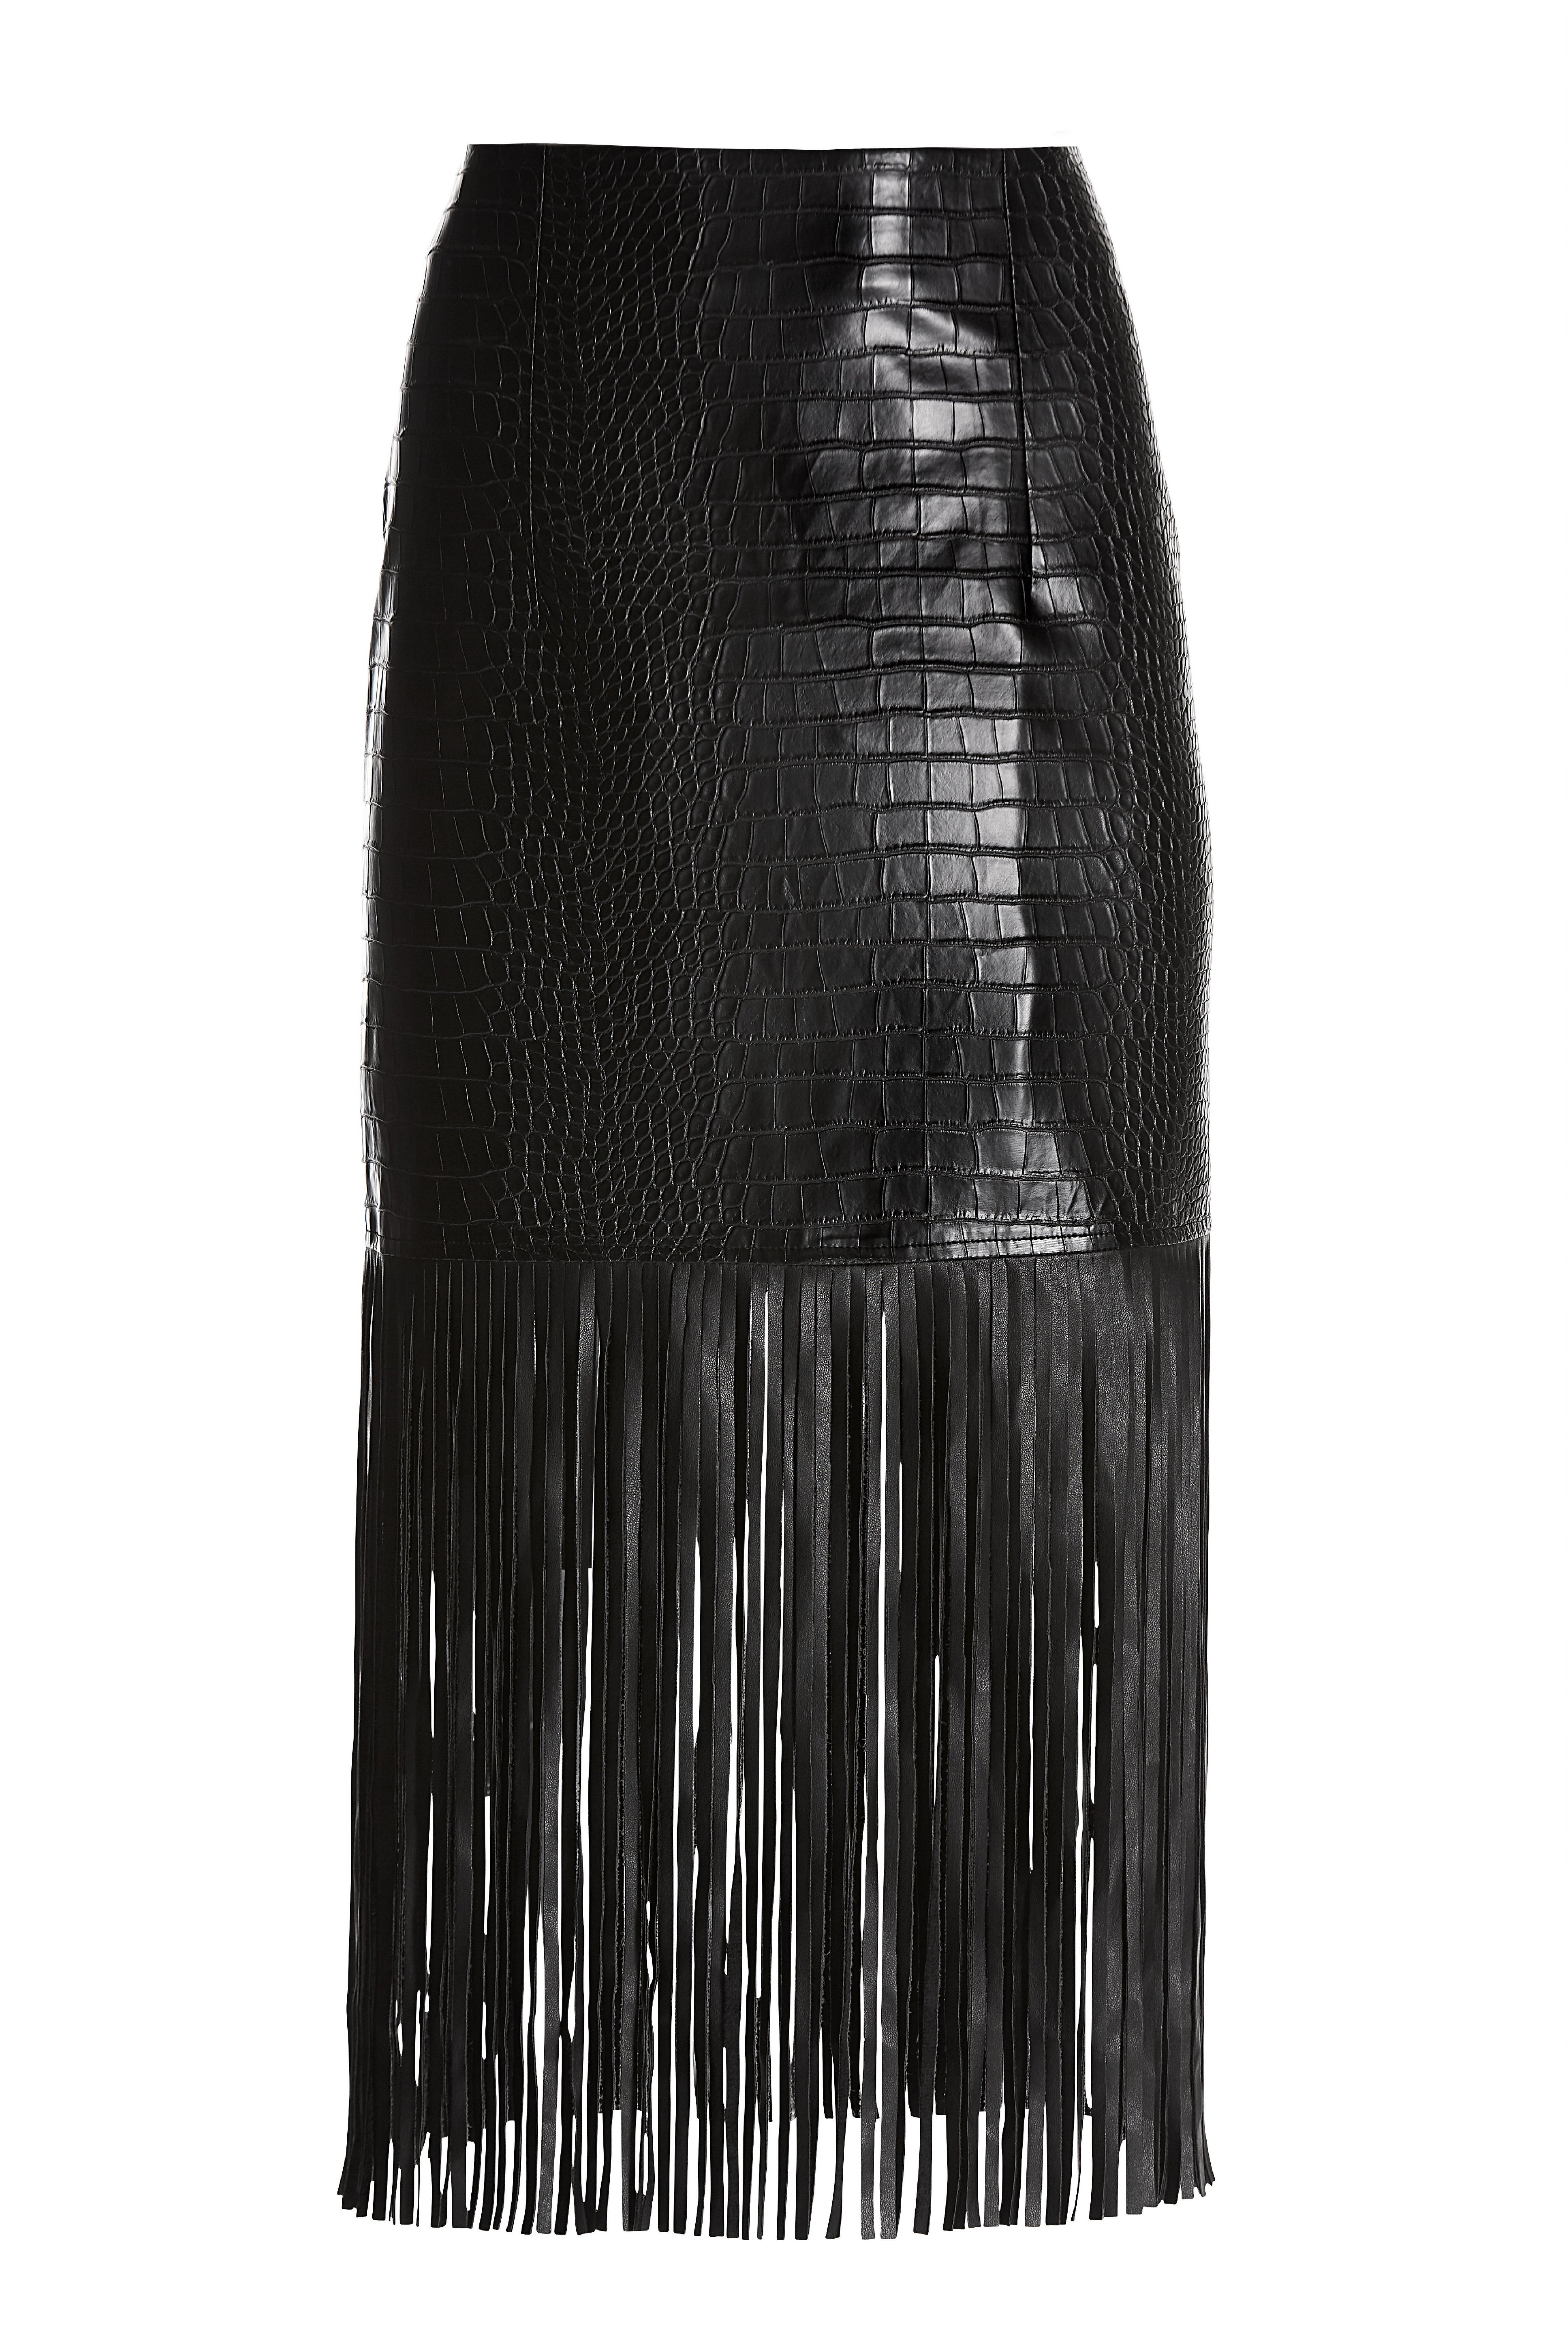 black faux leather croc fringe skirt.